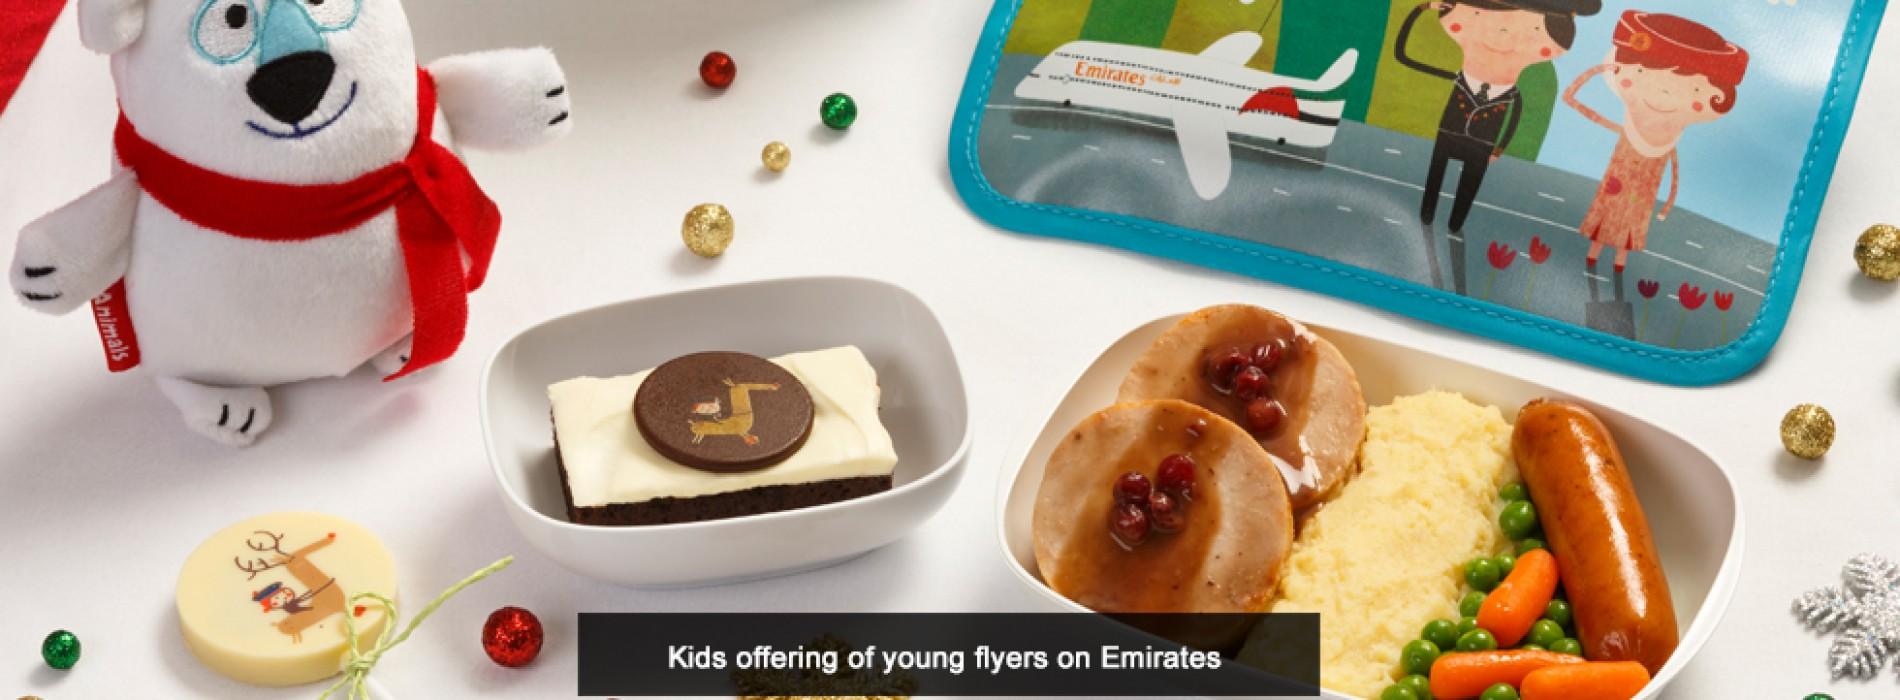 Emirates celebrates holiday season with special Christmas treats